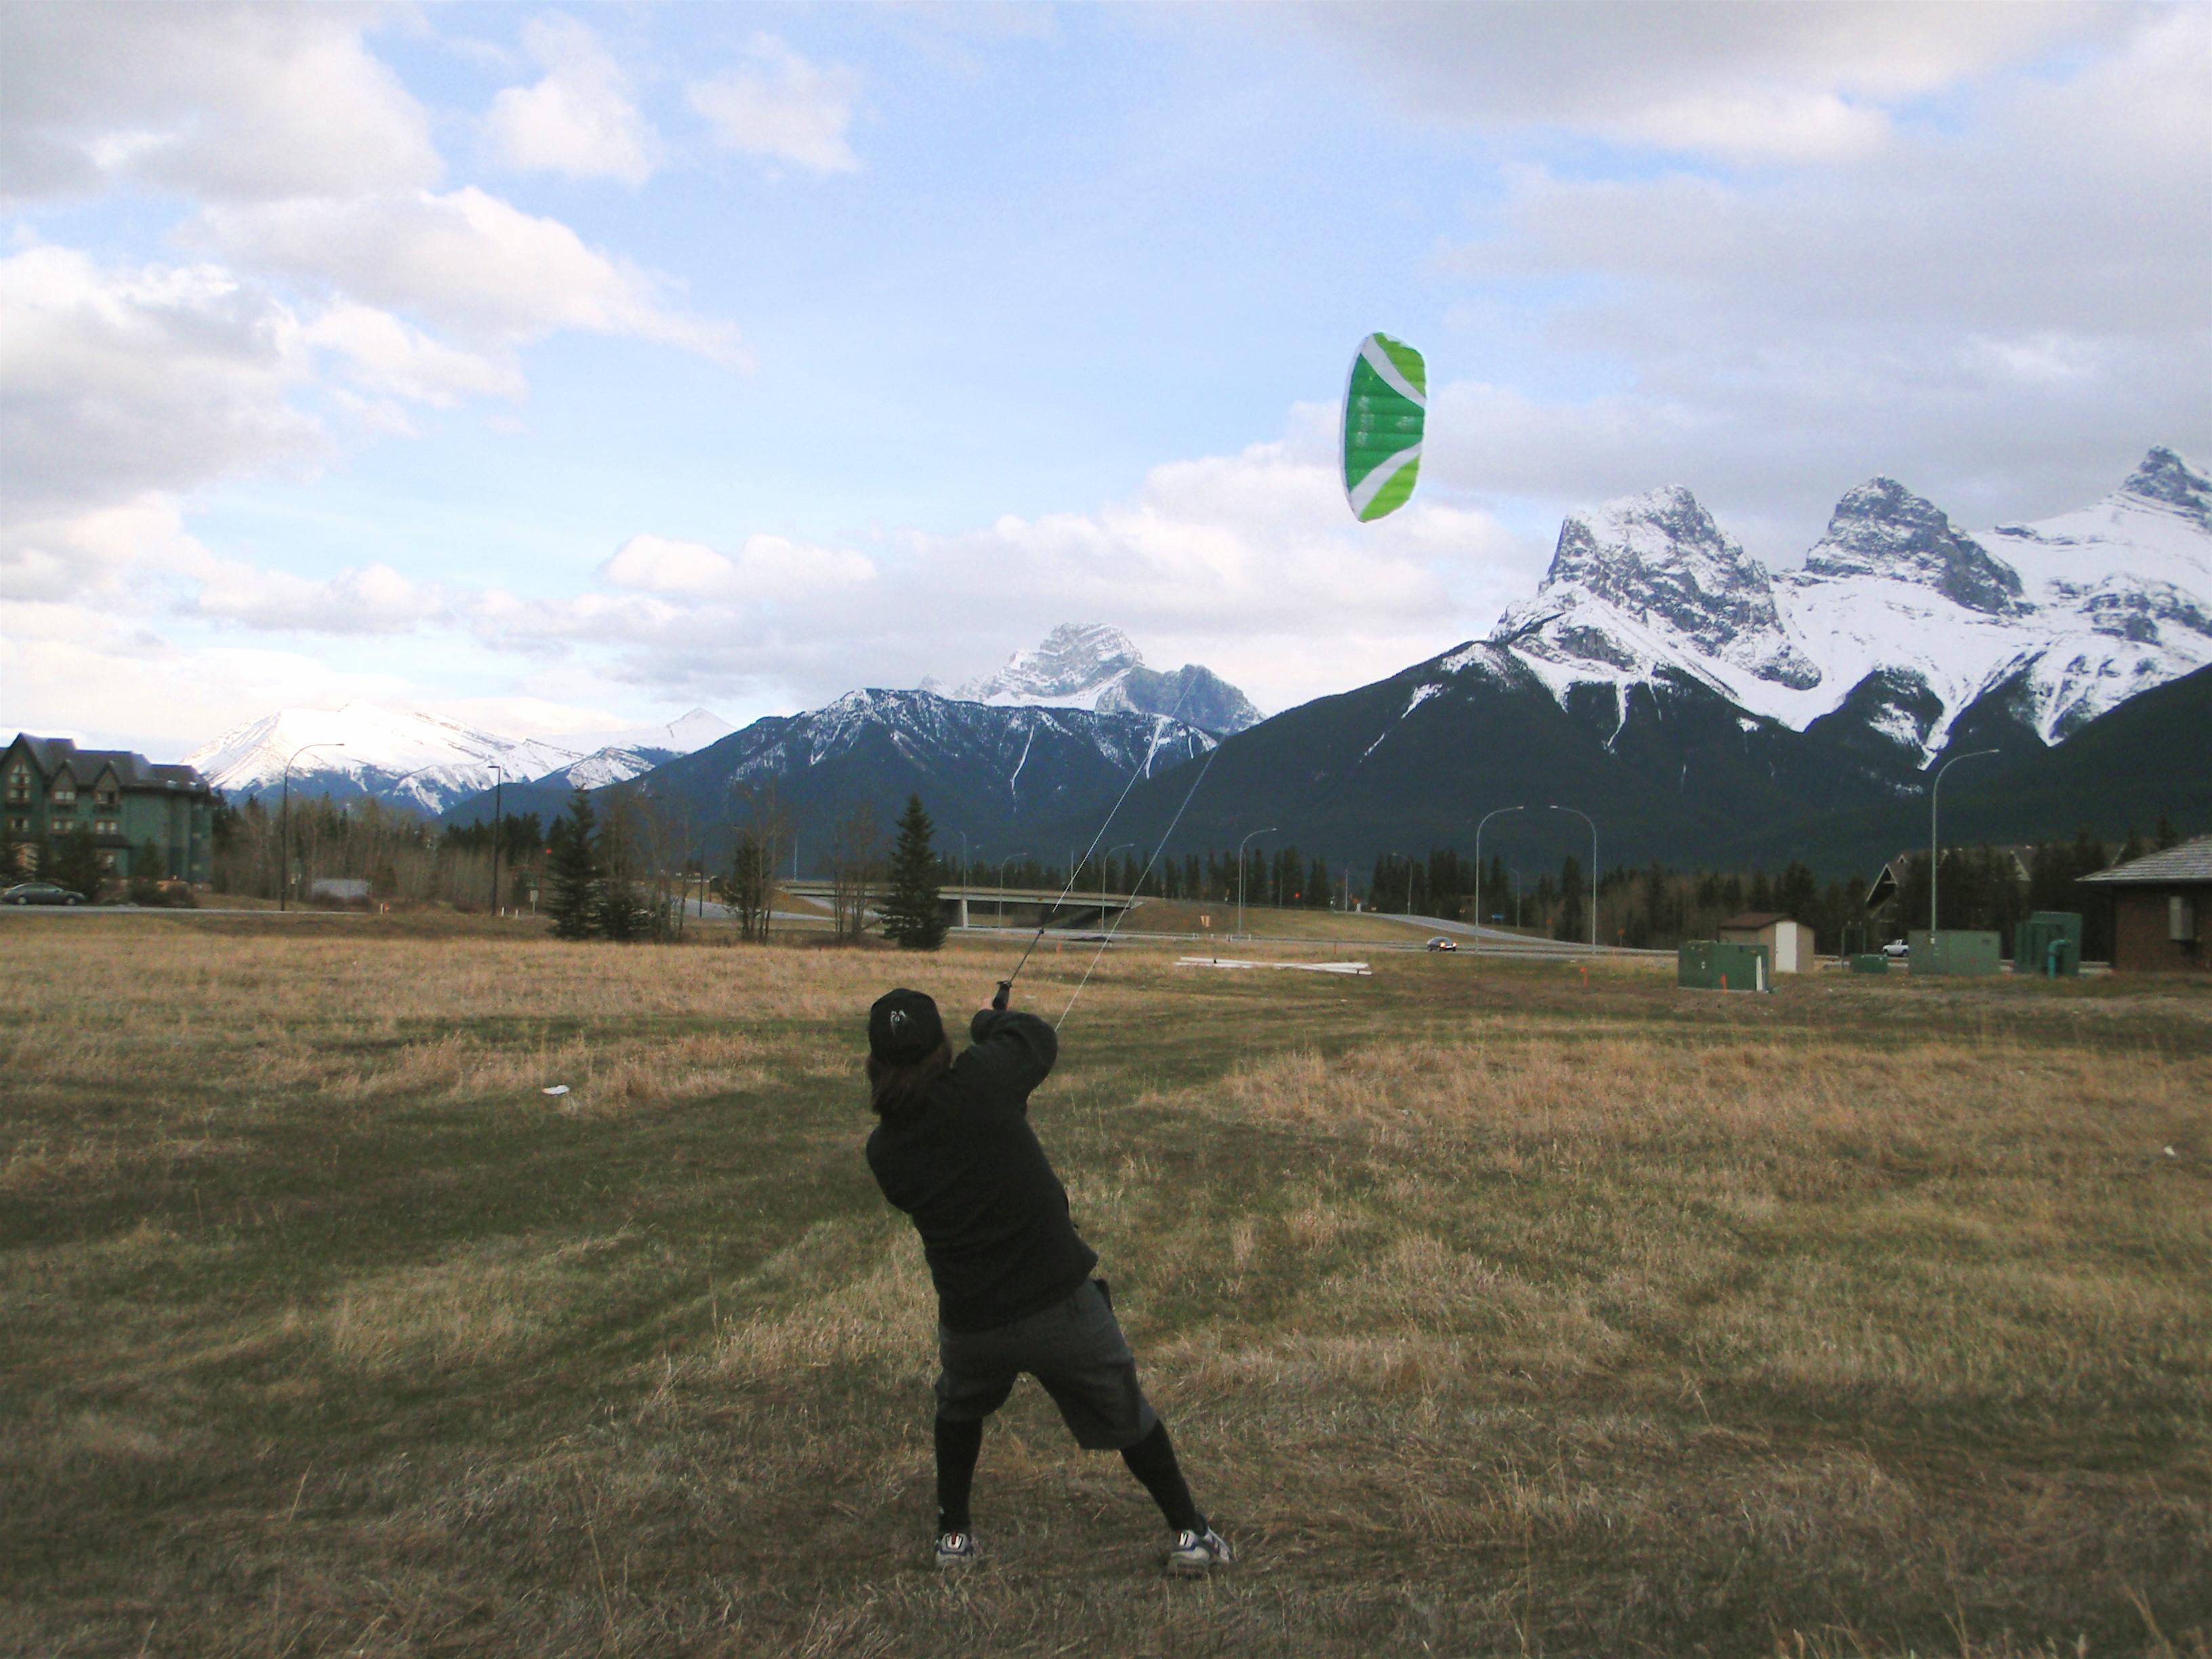 Kurt training with a 2.3m 2 line power kite.